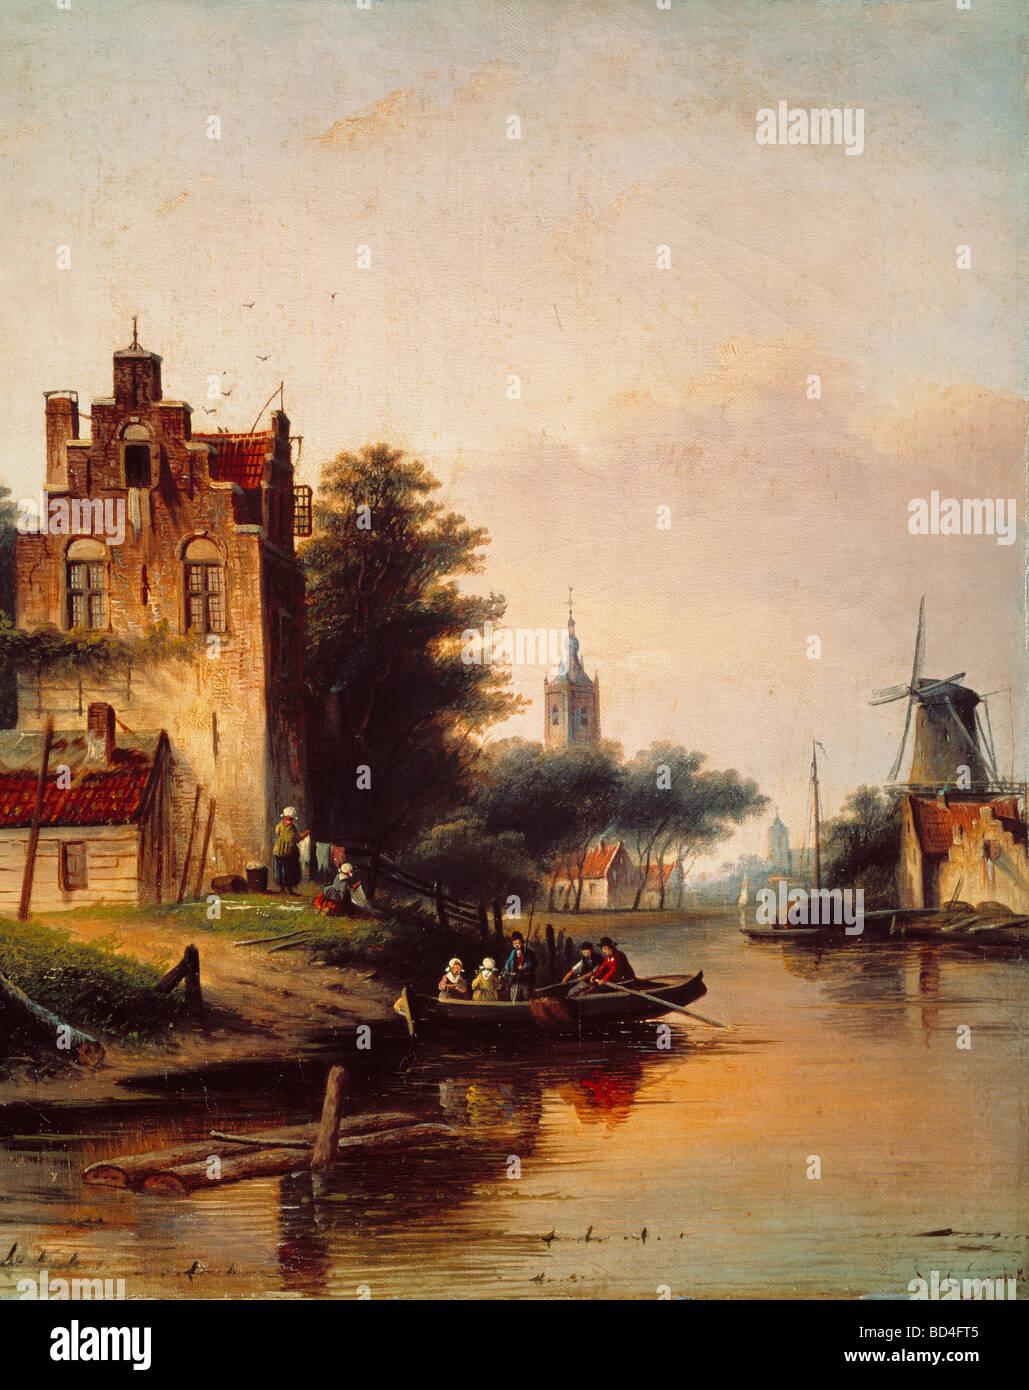 Spohler, bellas artes, Jan Jacob (1811 - 1879), pintura, viaje en barco, Holandés, barcazas, ocio, romántico, Imagen De Stock